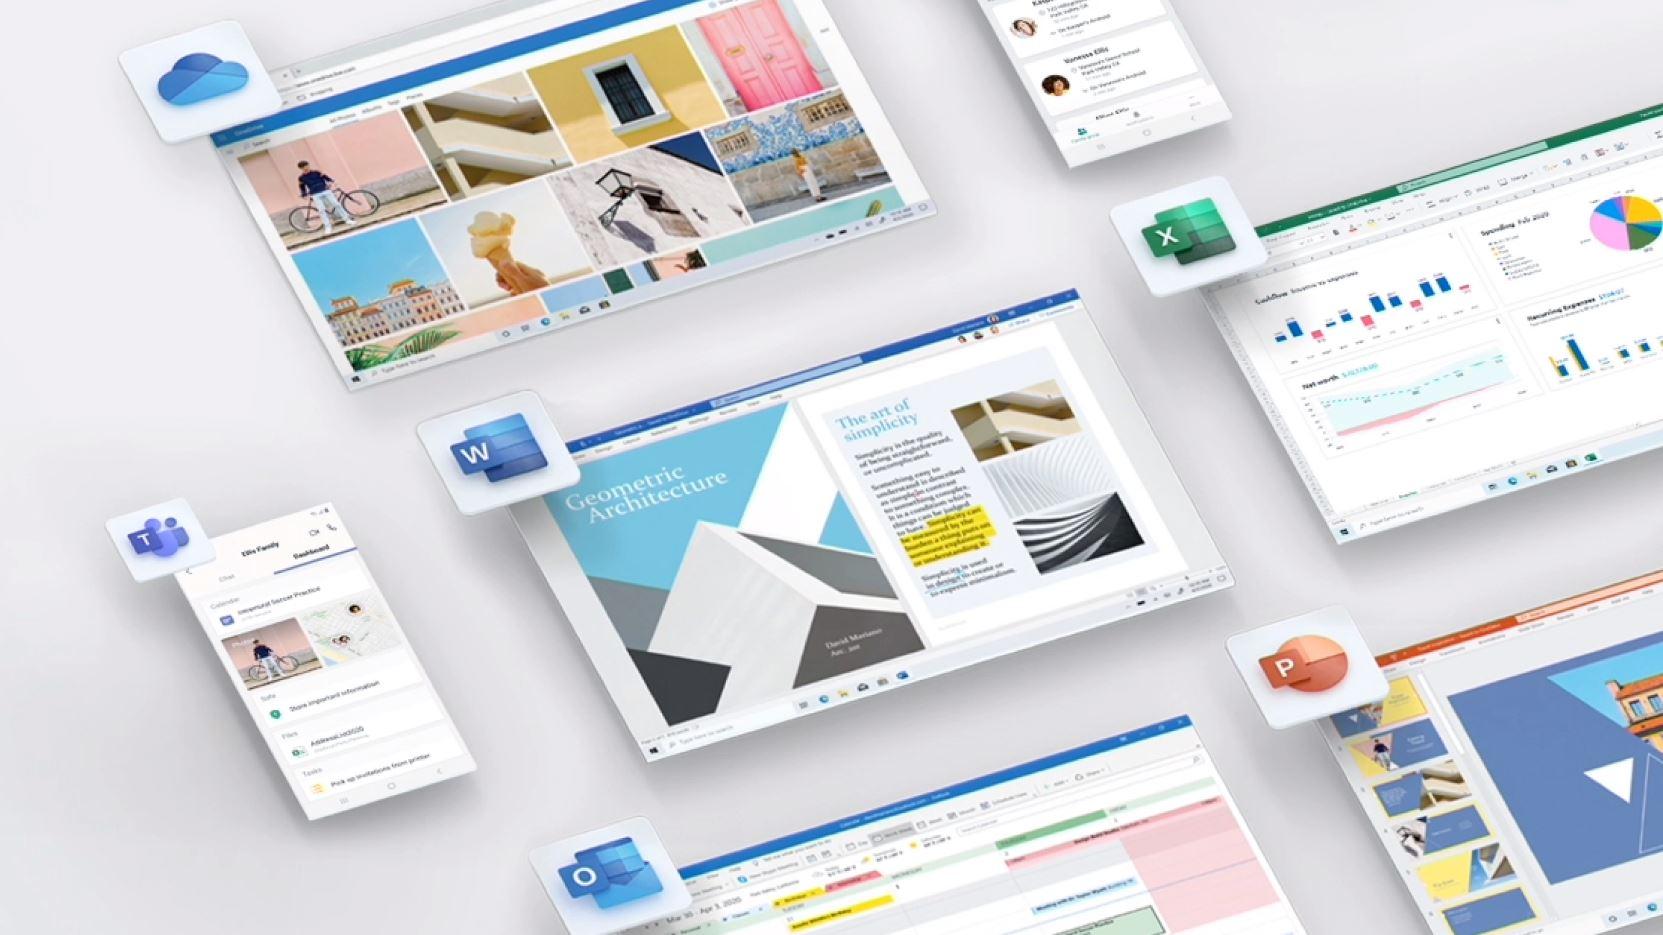 Microsoft 365 Applications